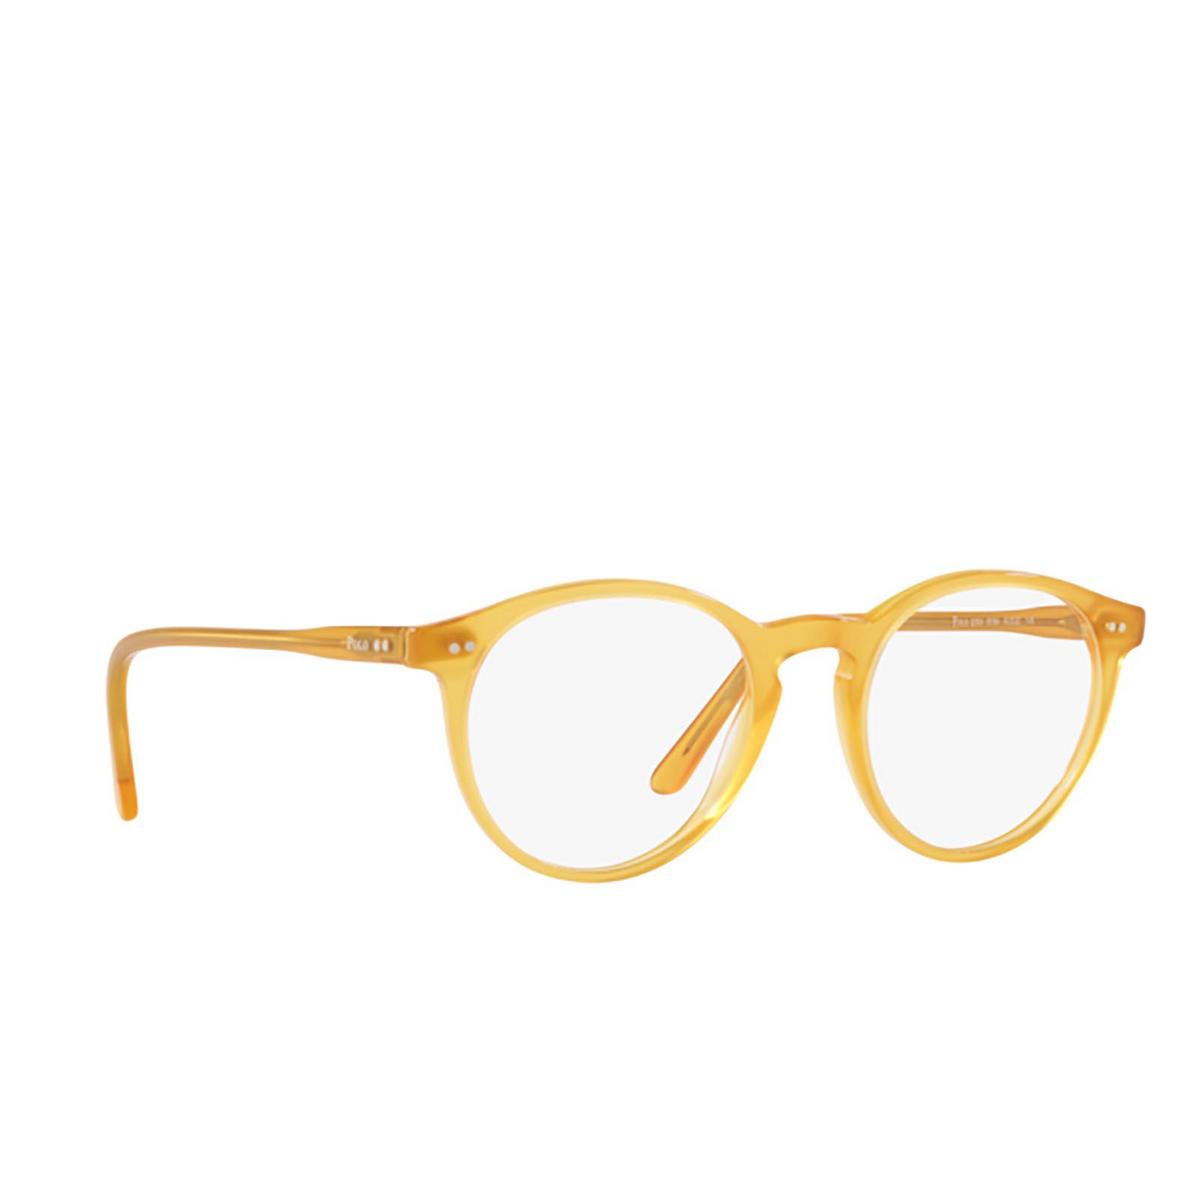 Polo Ralph Lauren® Round Eyeglasses: PH2083 color Shiny Honey 5184 - three-quarters view.